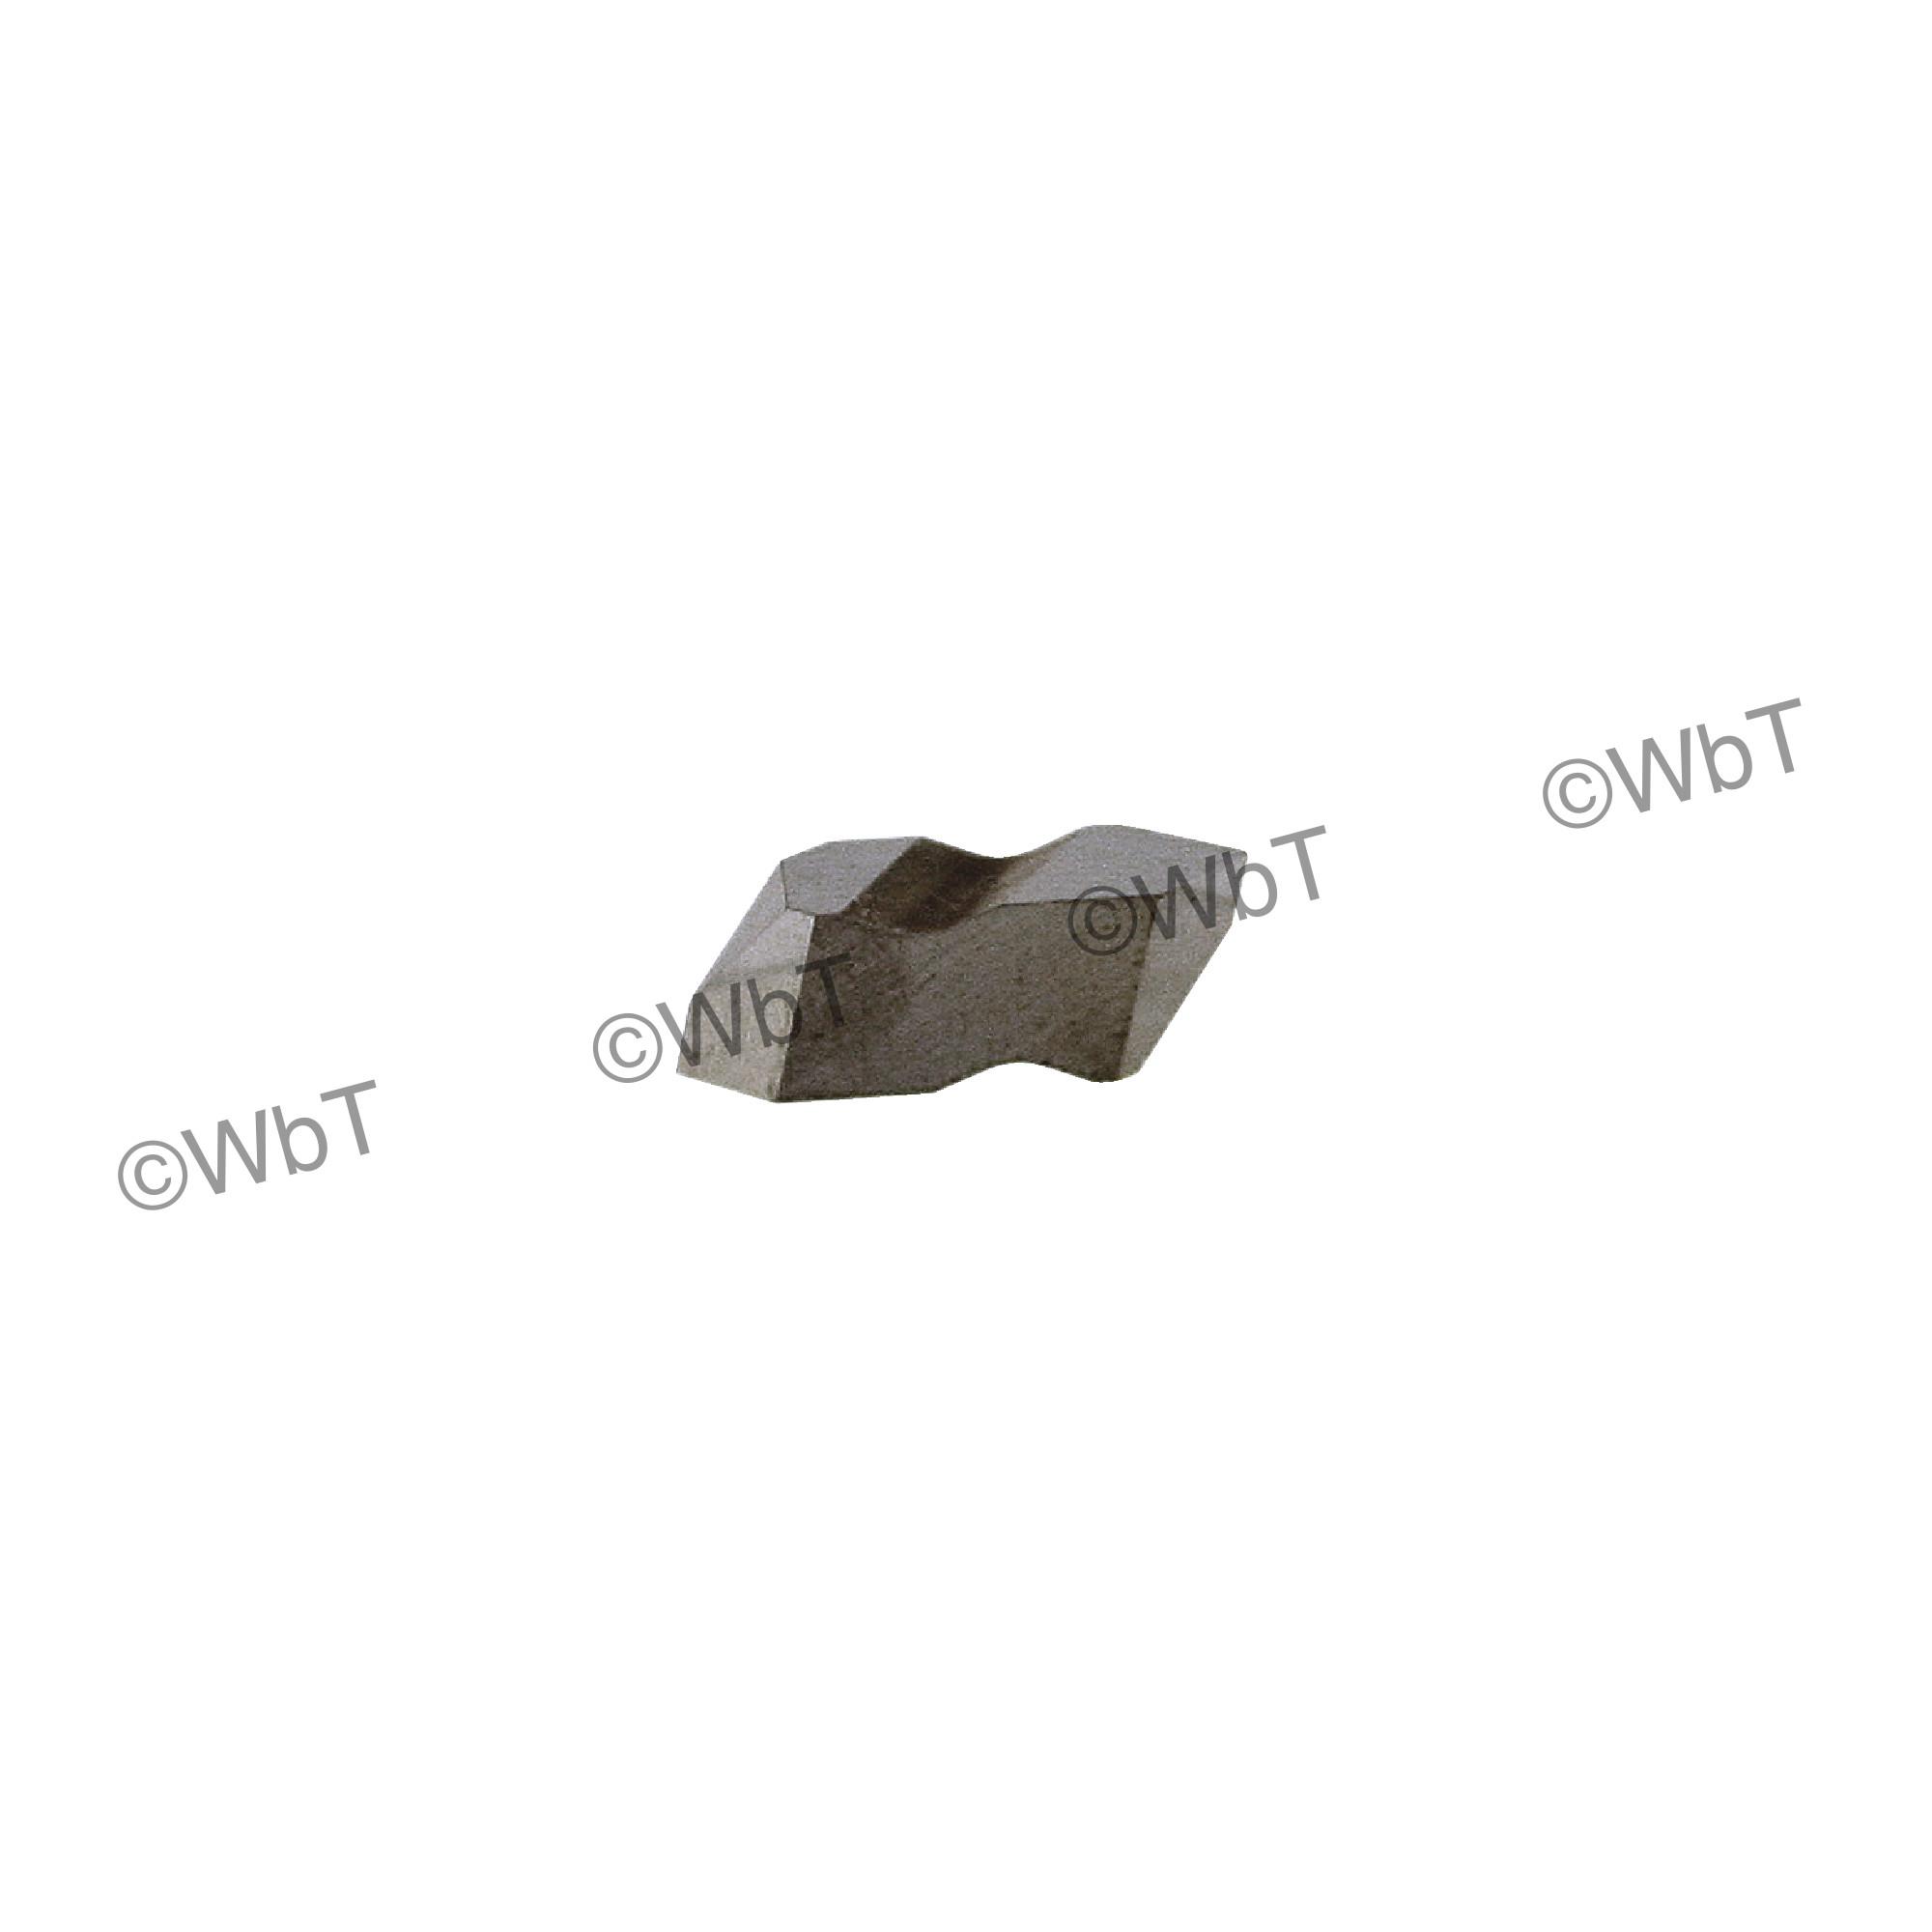 TERRA CARBIDE - TNT2L APC2 / Top Clamp INDEXABLE CARBIDE THREADING INSERT / 60°  V-THREADING / Left Hand